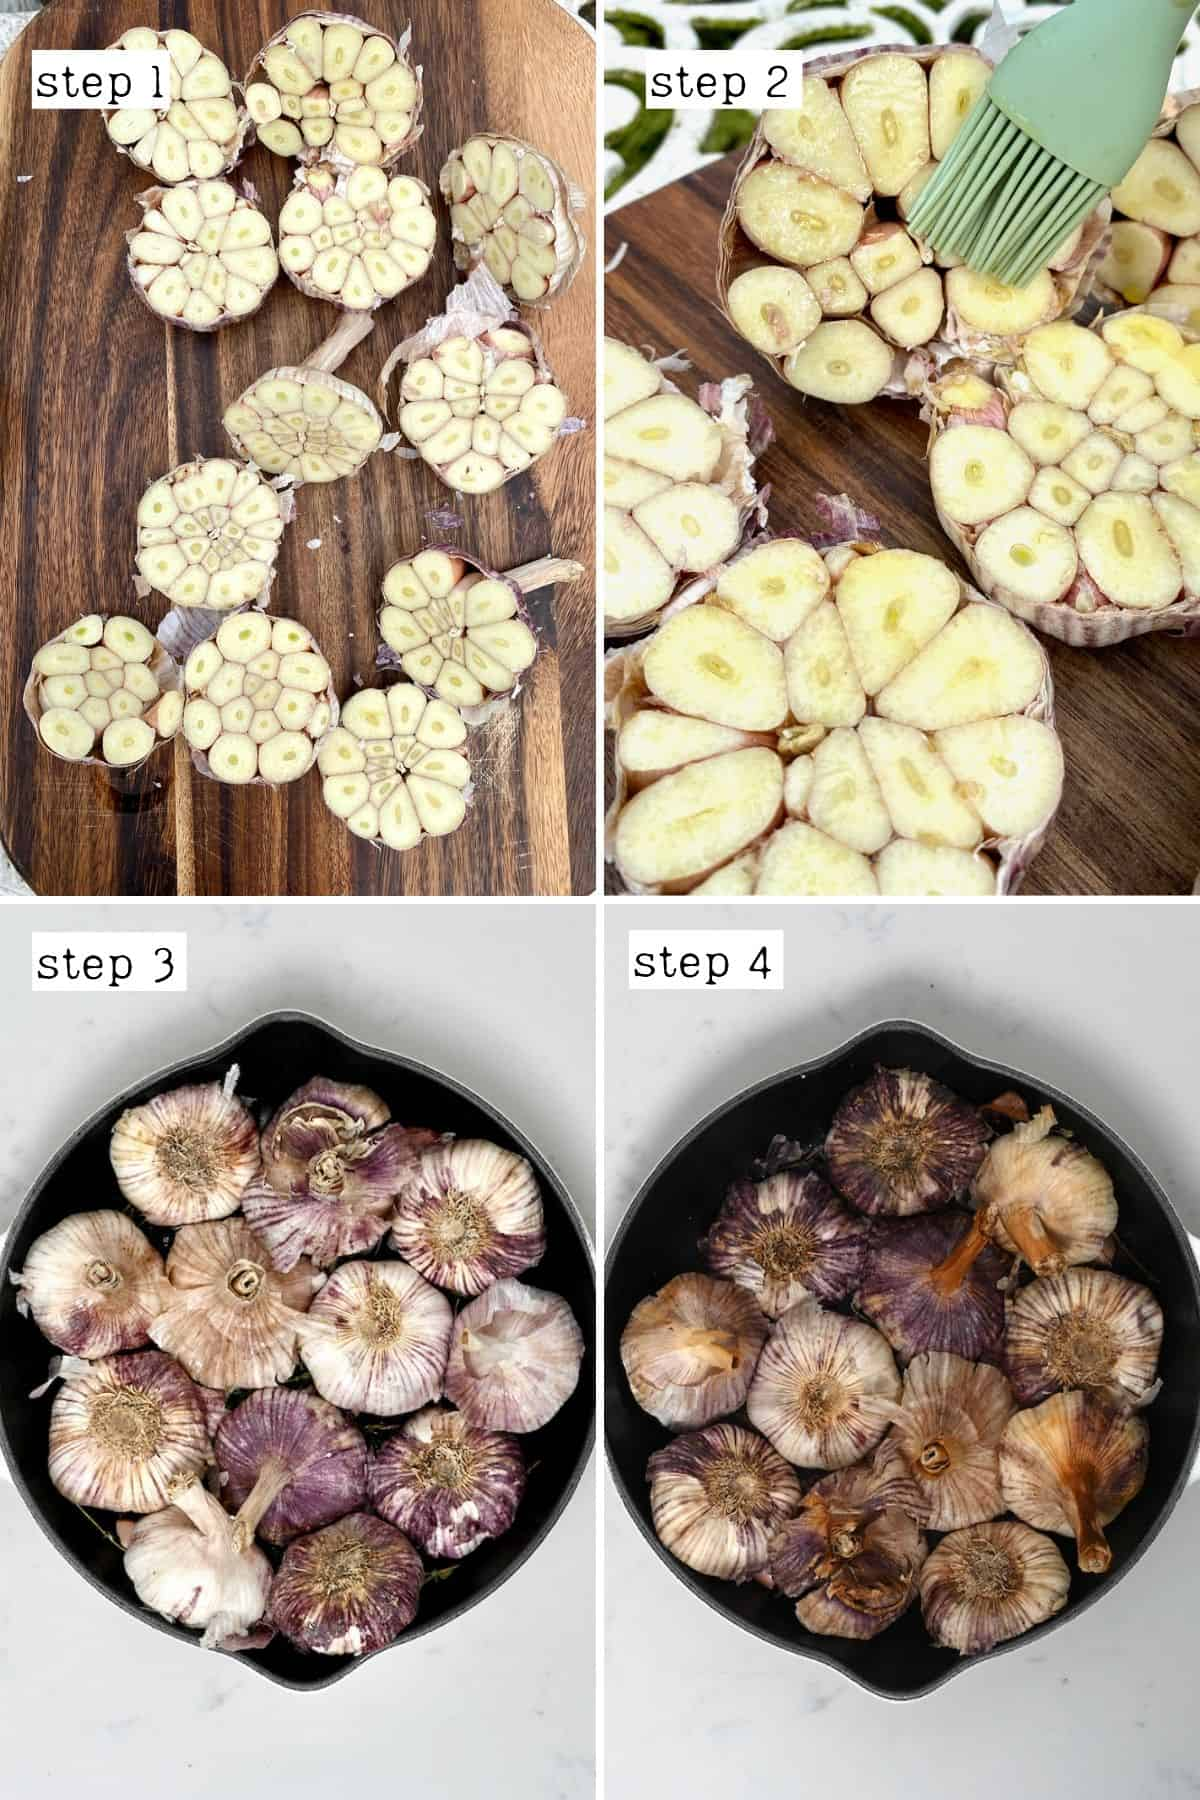 Steps for roasting garlic